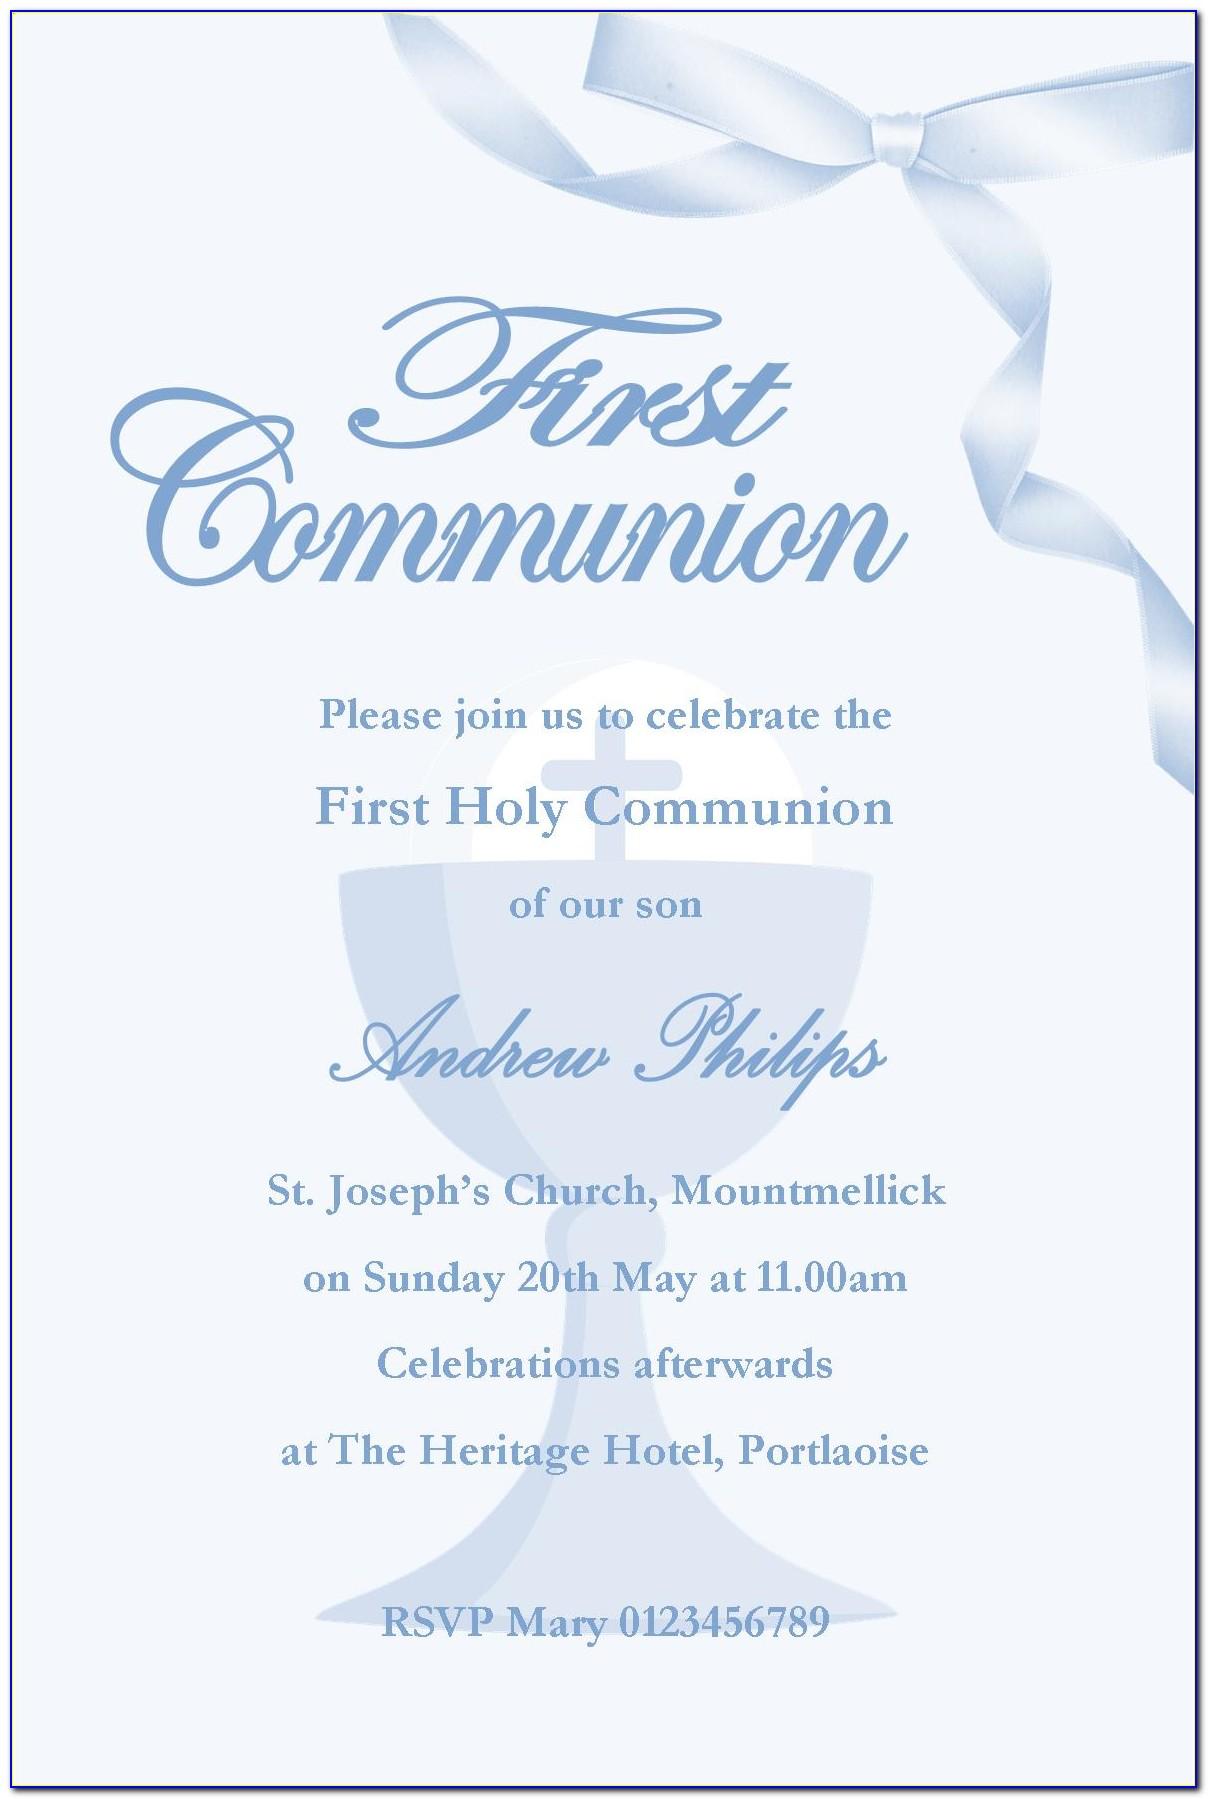 First Holy Communion Invitation Sample